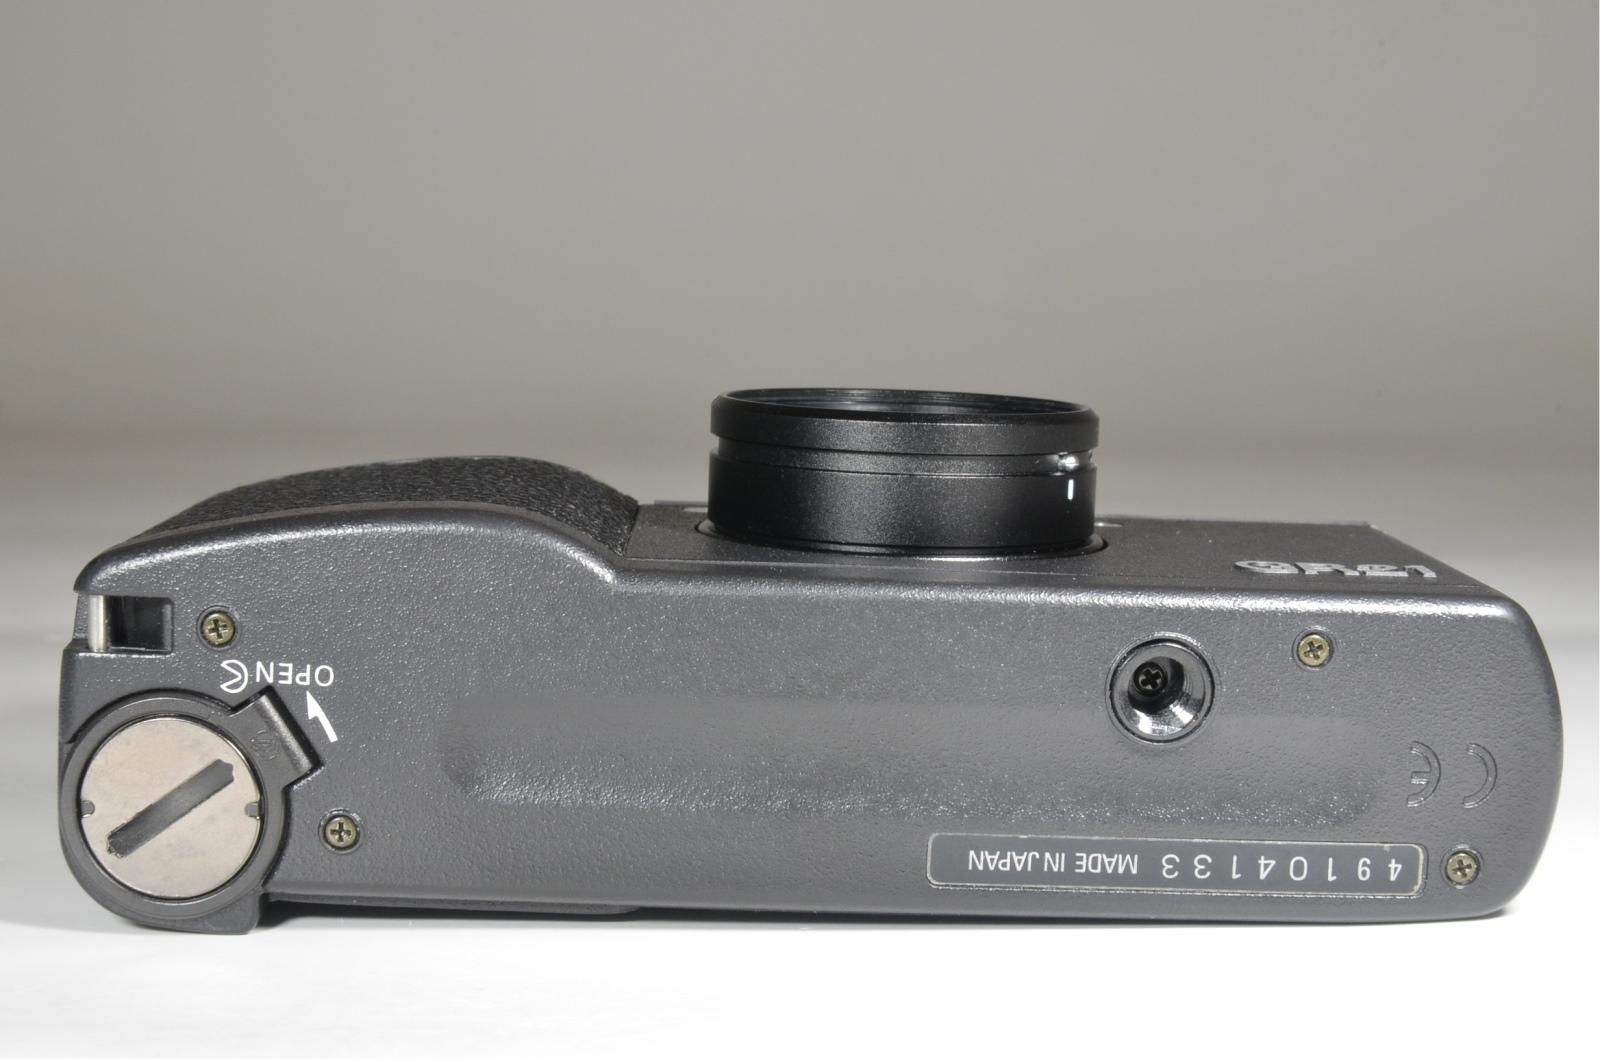 ricoh gr21 35mm point & shoot film camera